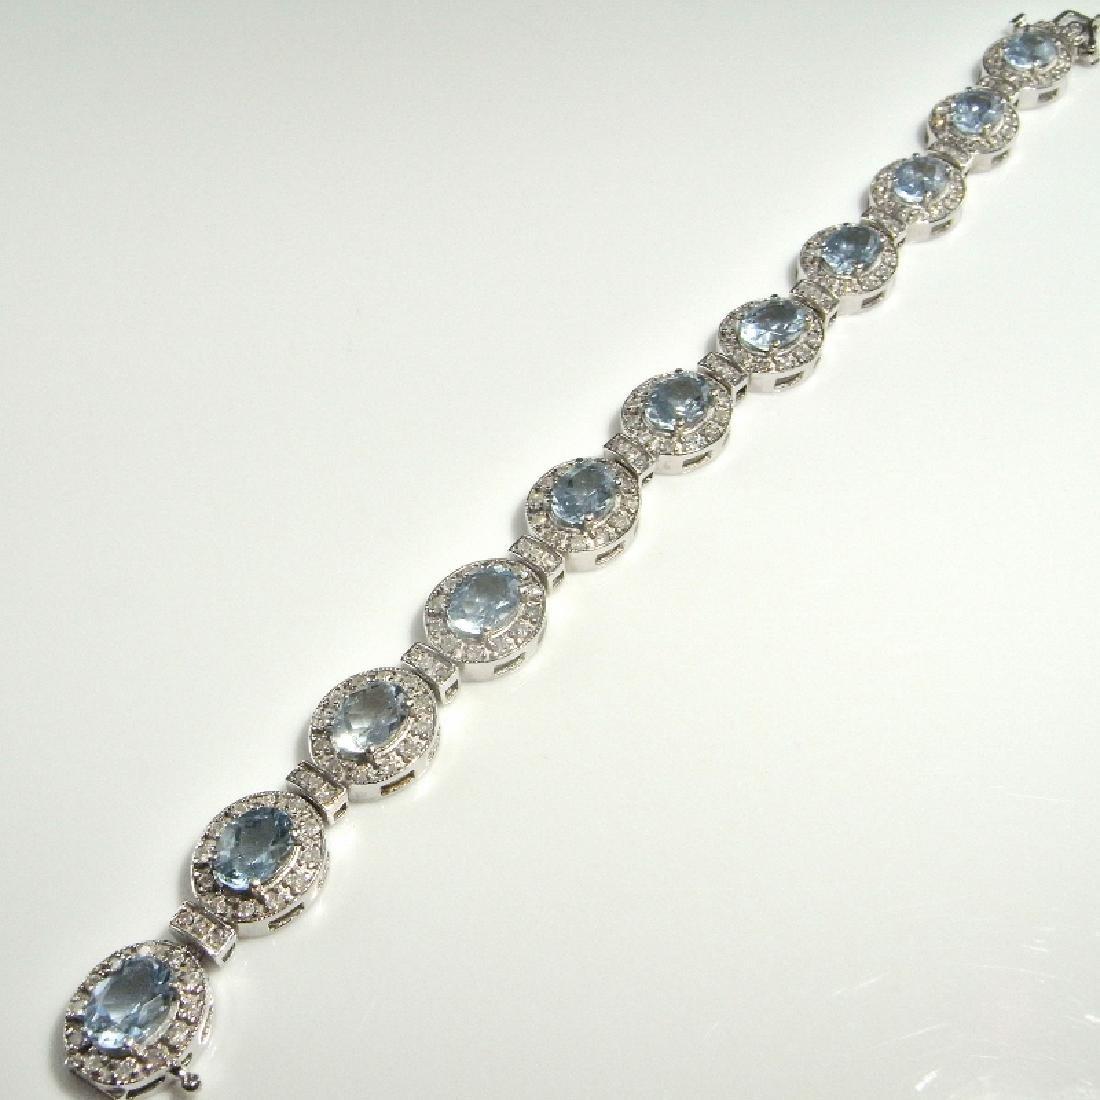 AQUAMARINE DIAMOND BRACELET 14K GOLD 16.61 CTW - 4